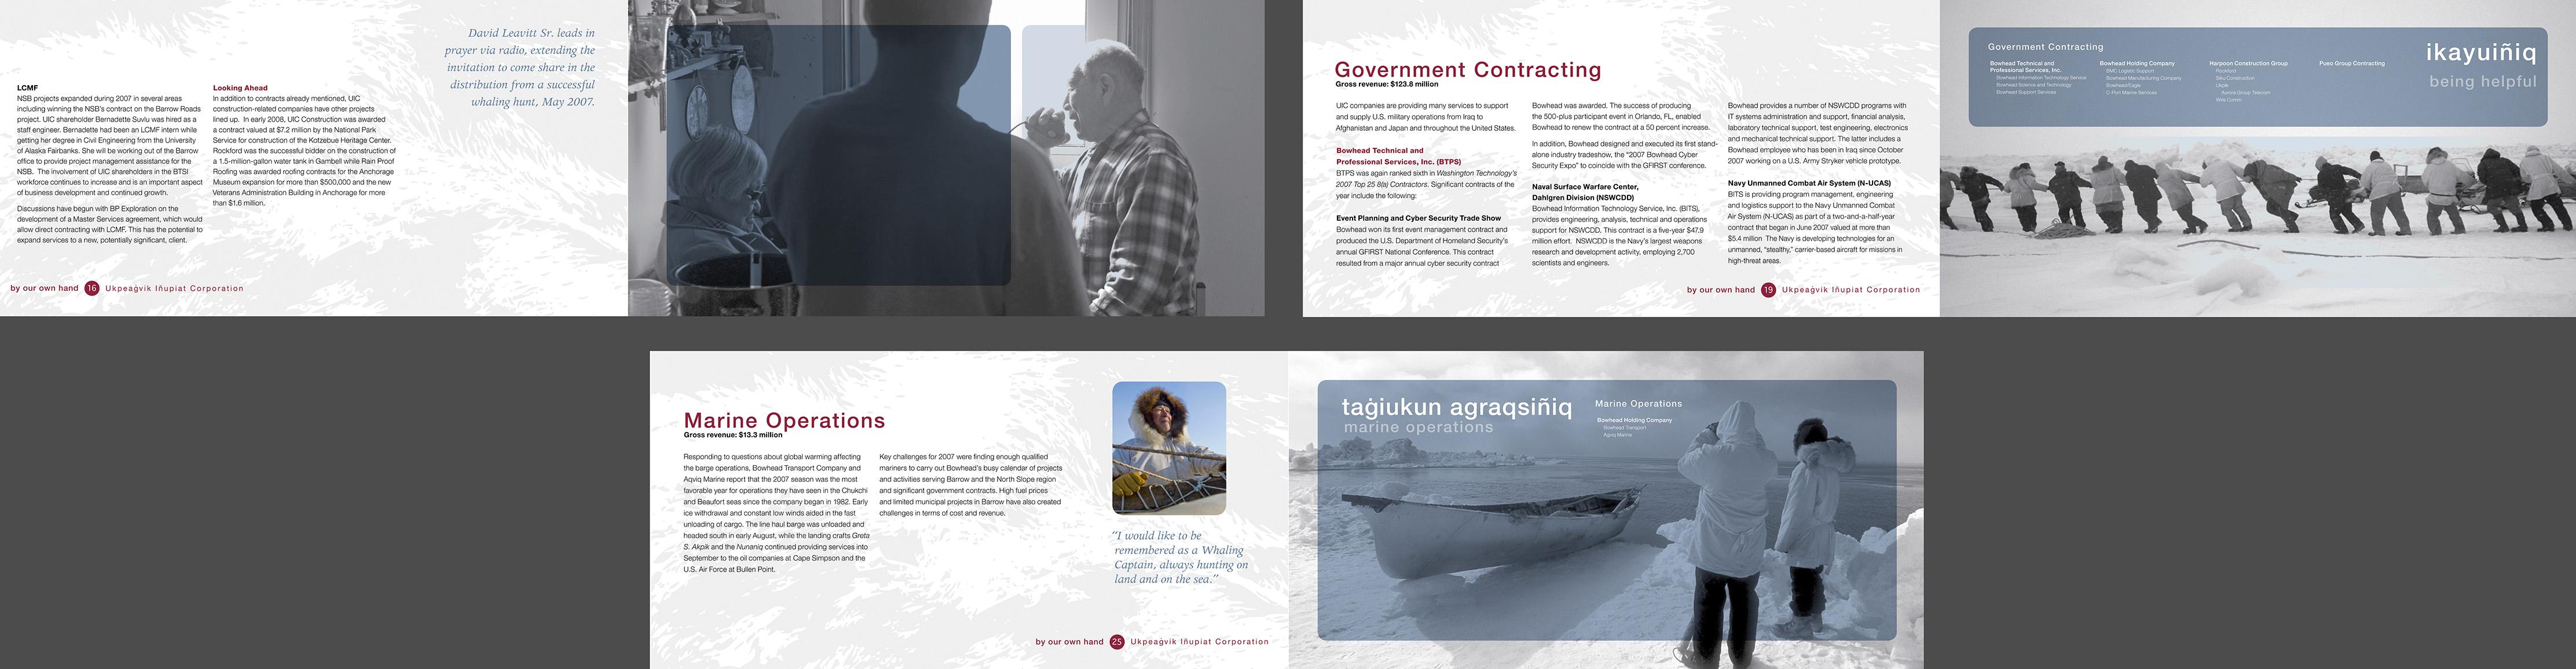 Ukpeagvik iñupiat Corporation Annual Report